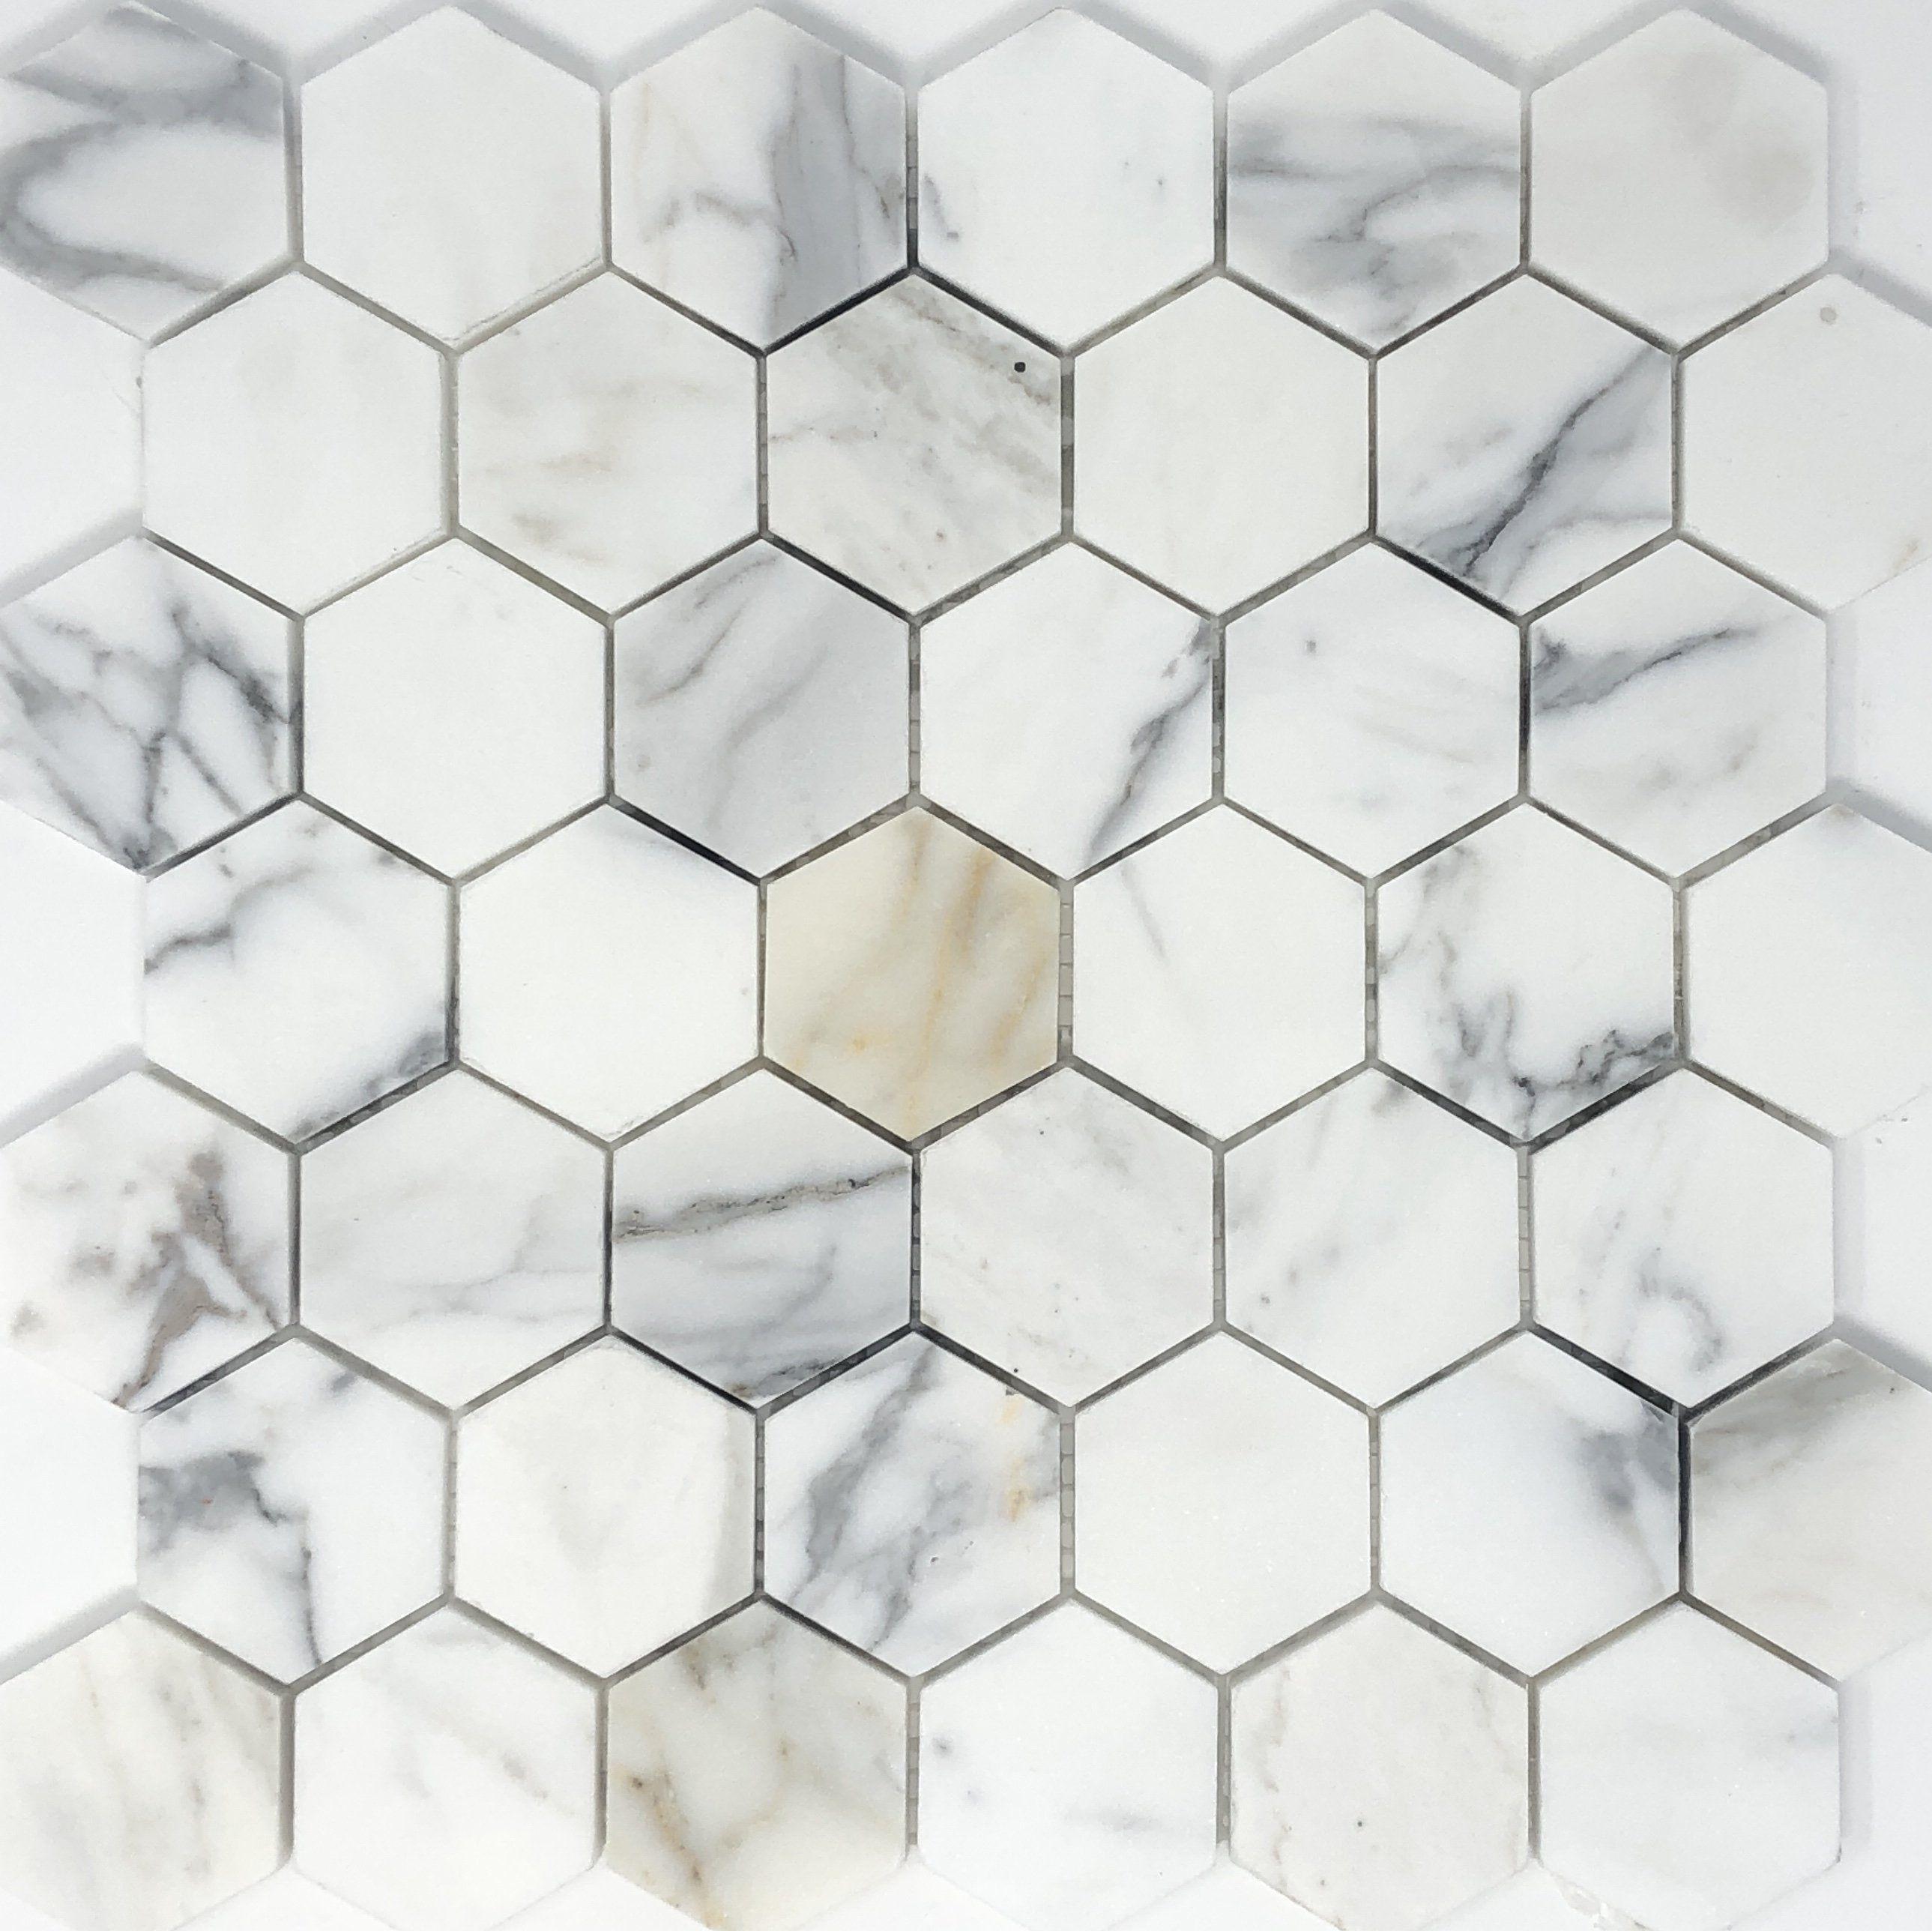 Calacatta Gold Hexagon 2 Marble Mosaic Polished Honed Marble Bathroom Marble Mosaic Hexagonal Mosaic